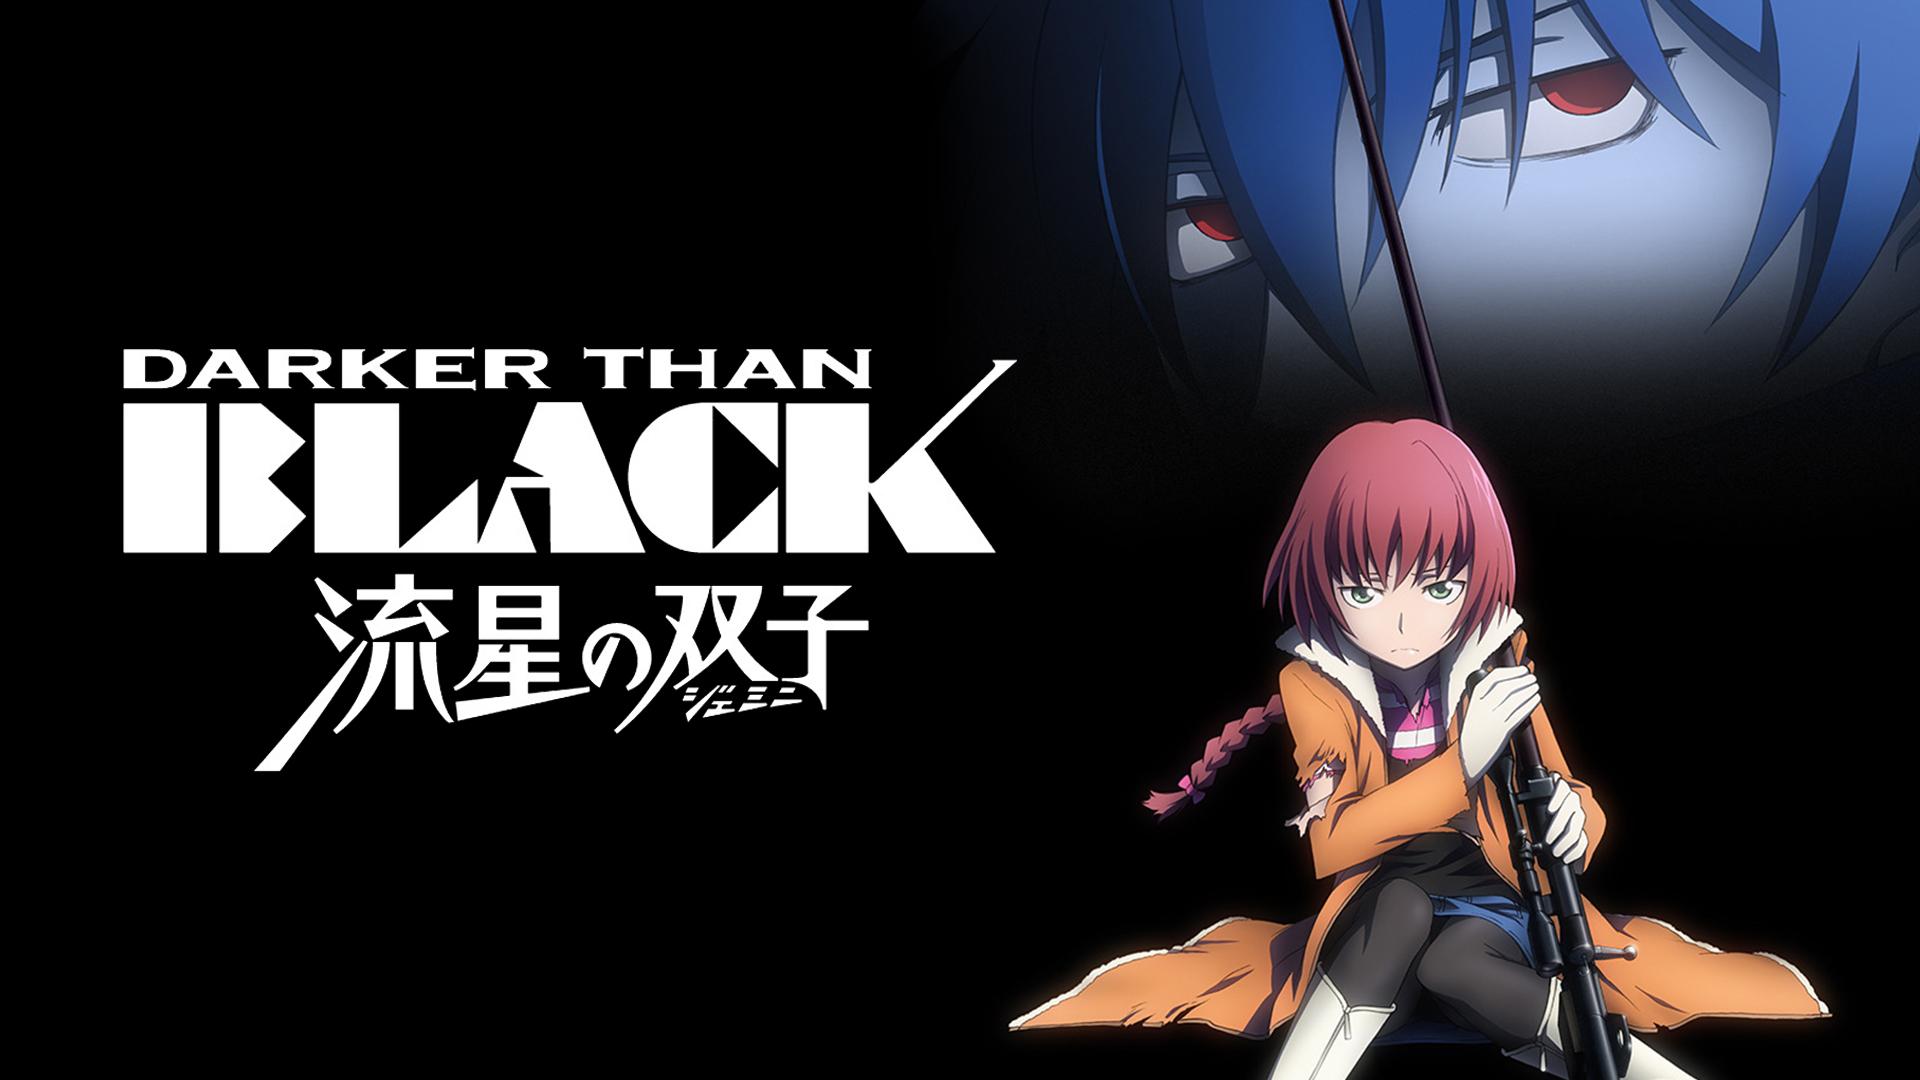 DARKER THAN BLACK-流星の双子-